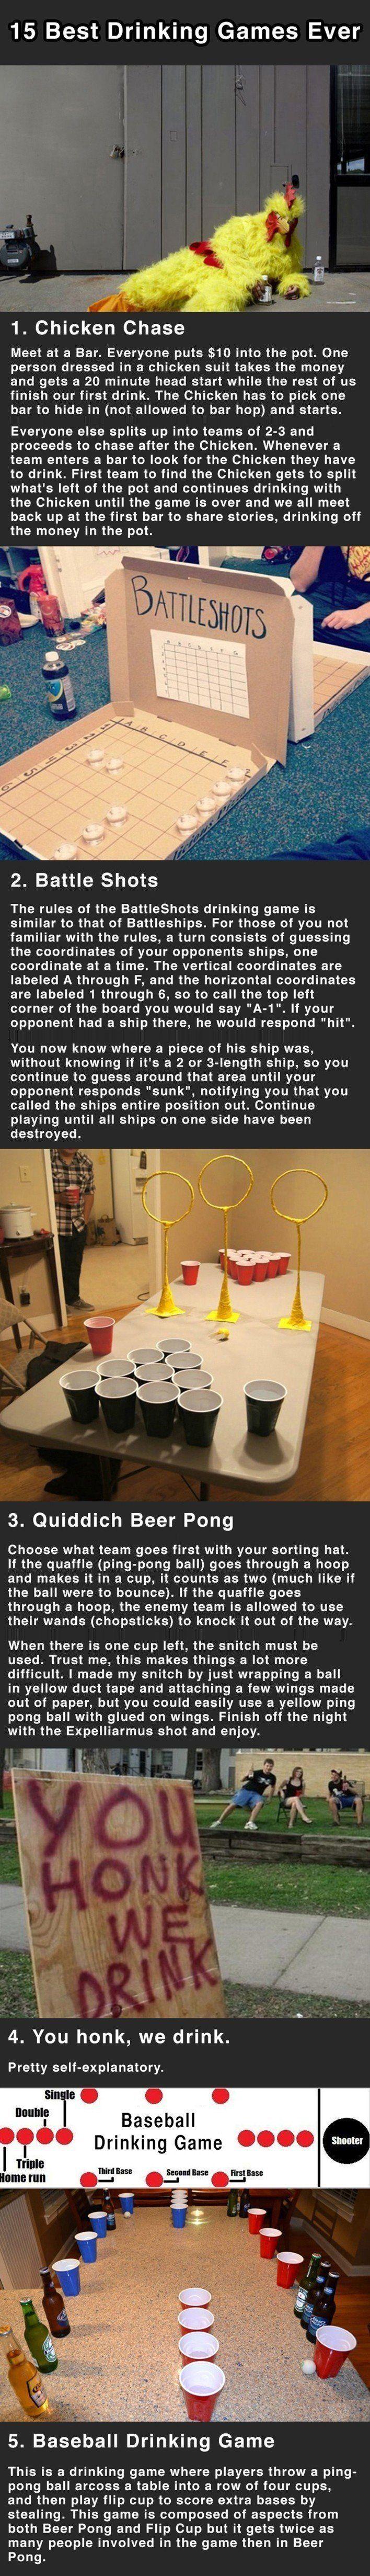 15 Best Drinking Games Ever. Number 7 Is Genius.